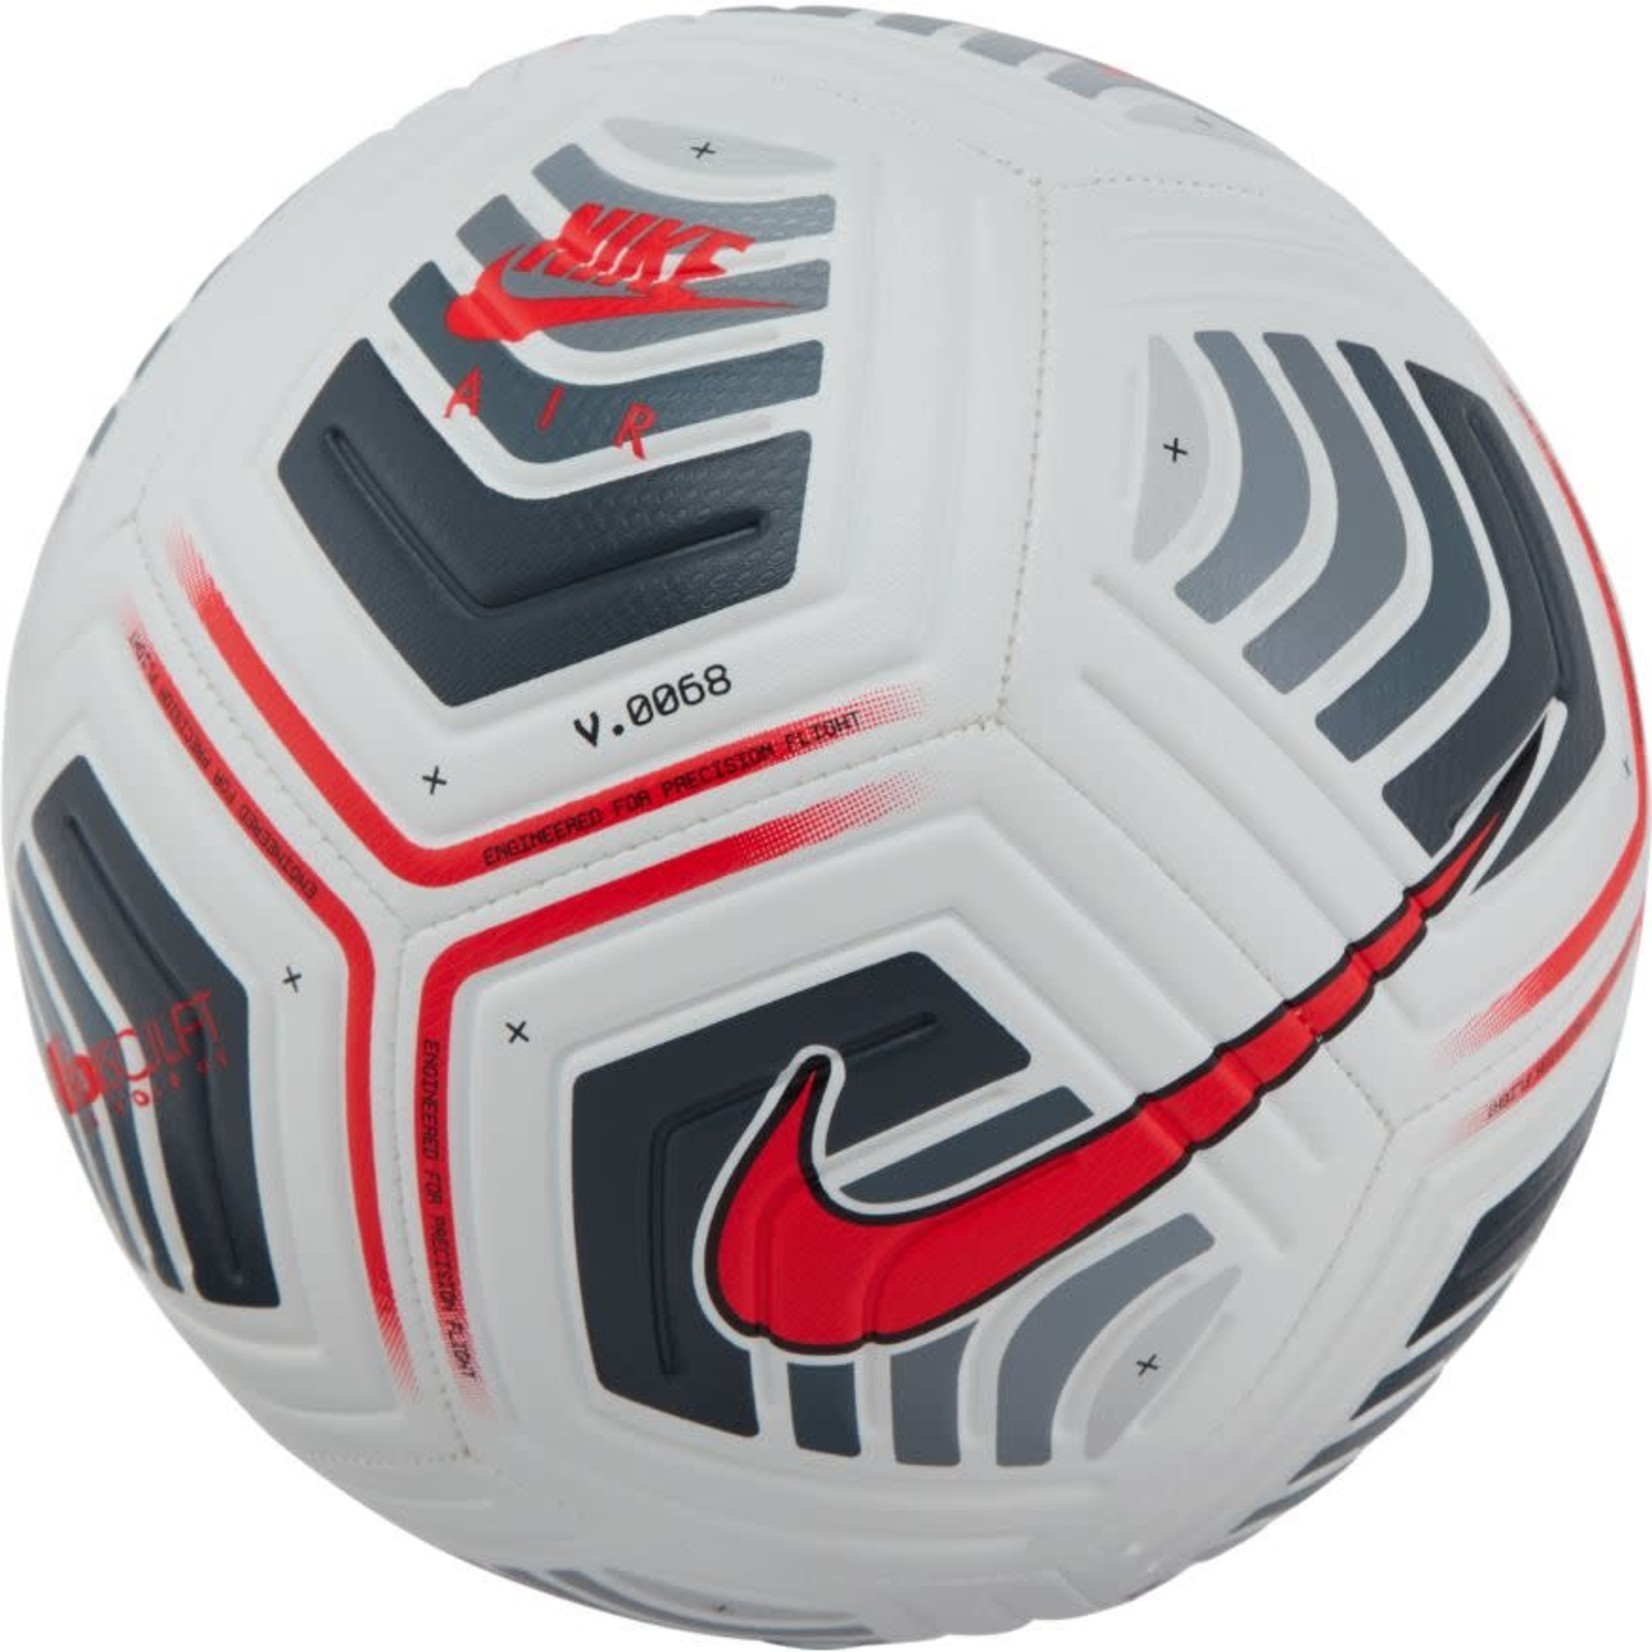 NIKE LIVERPOOL 20/21 STRIKE BALL (WHITE/GRAY/CRIMSON)